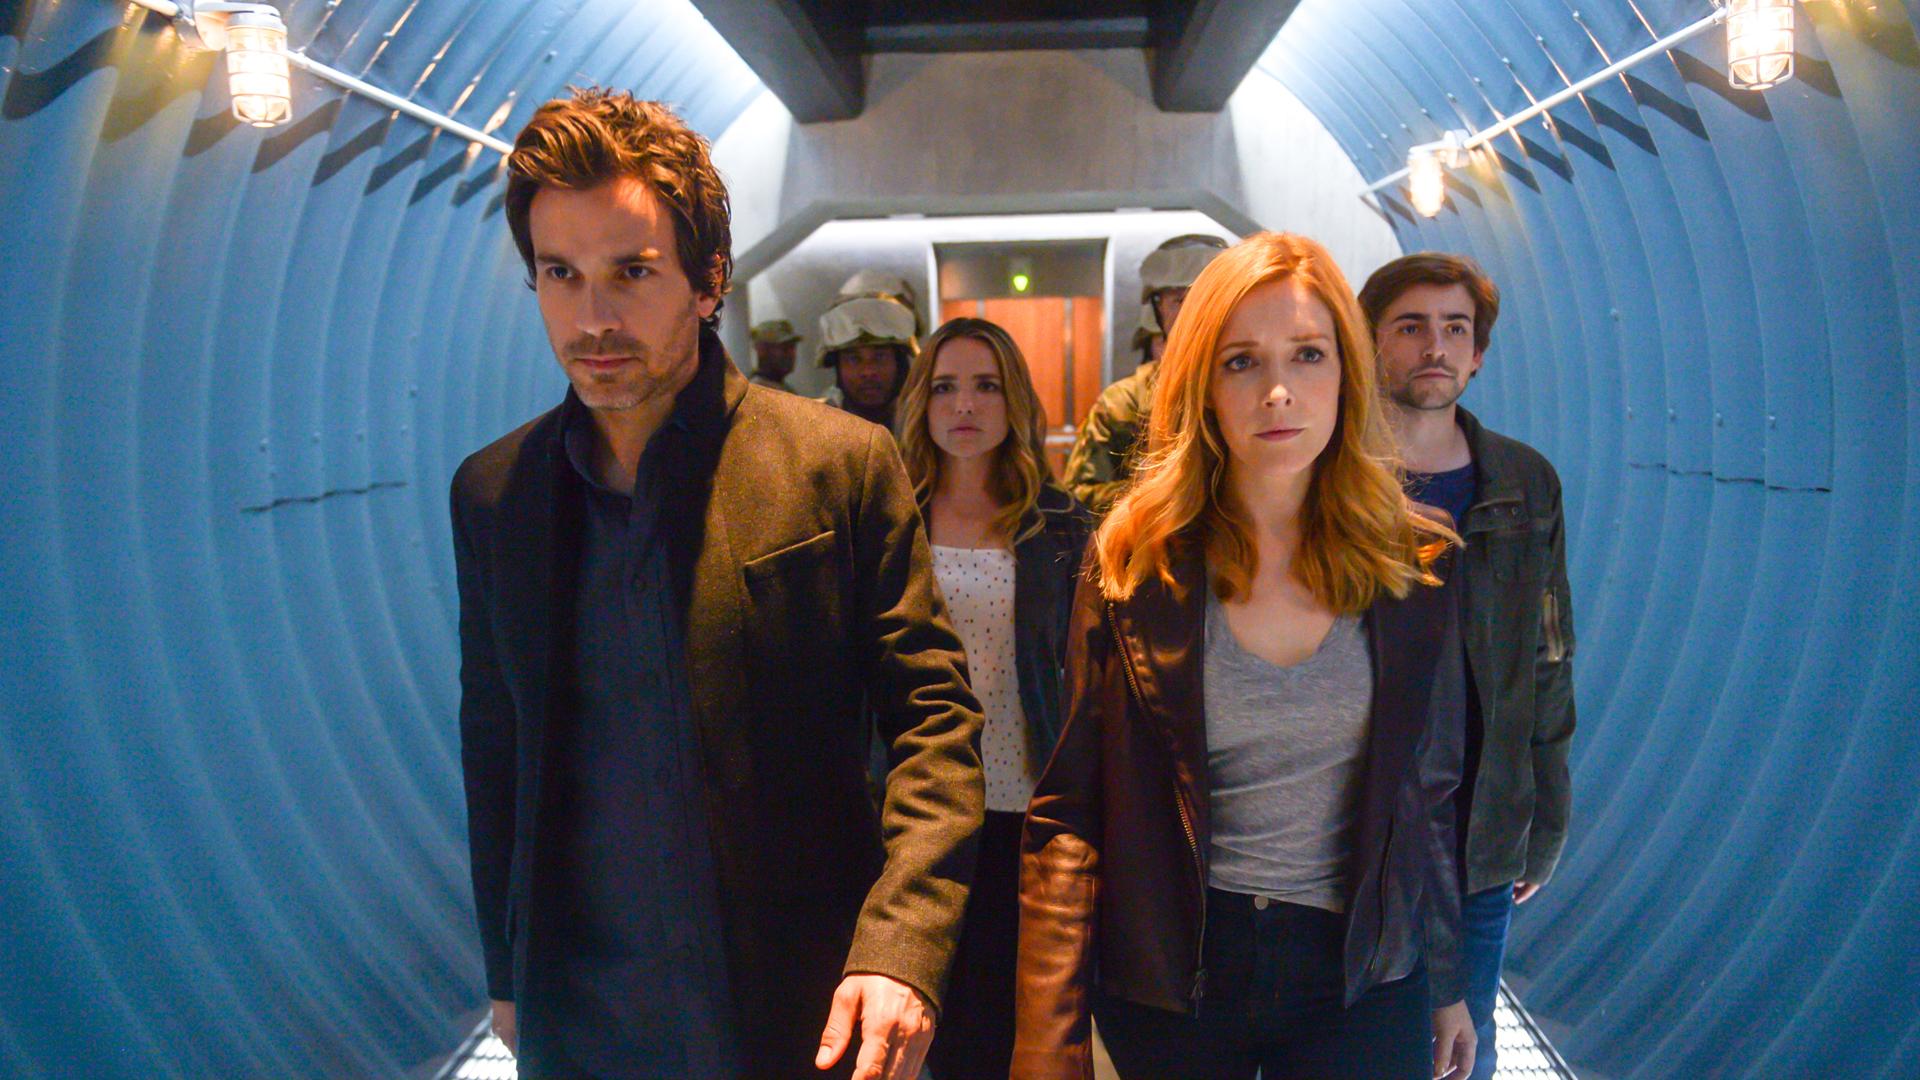 Watch Salvation Season 2 Episode 13: Get Ready - Full show on CBS All Access